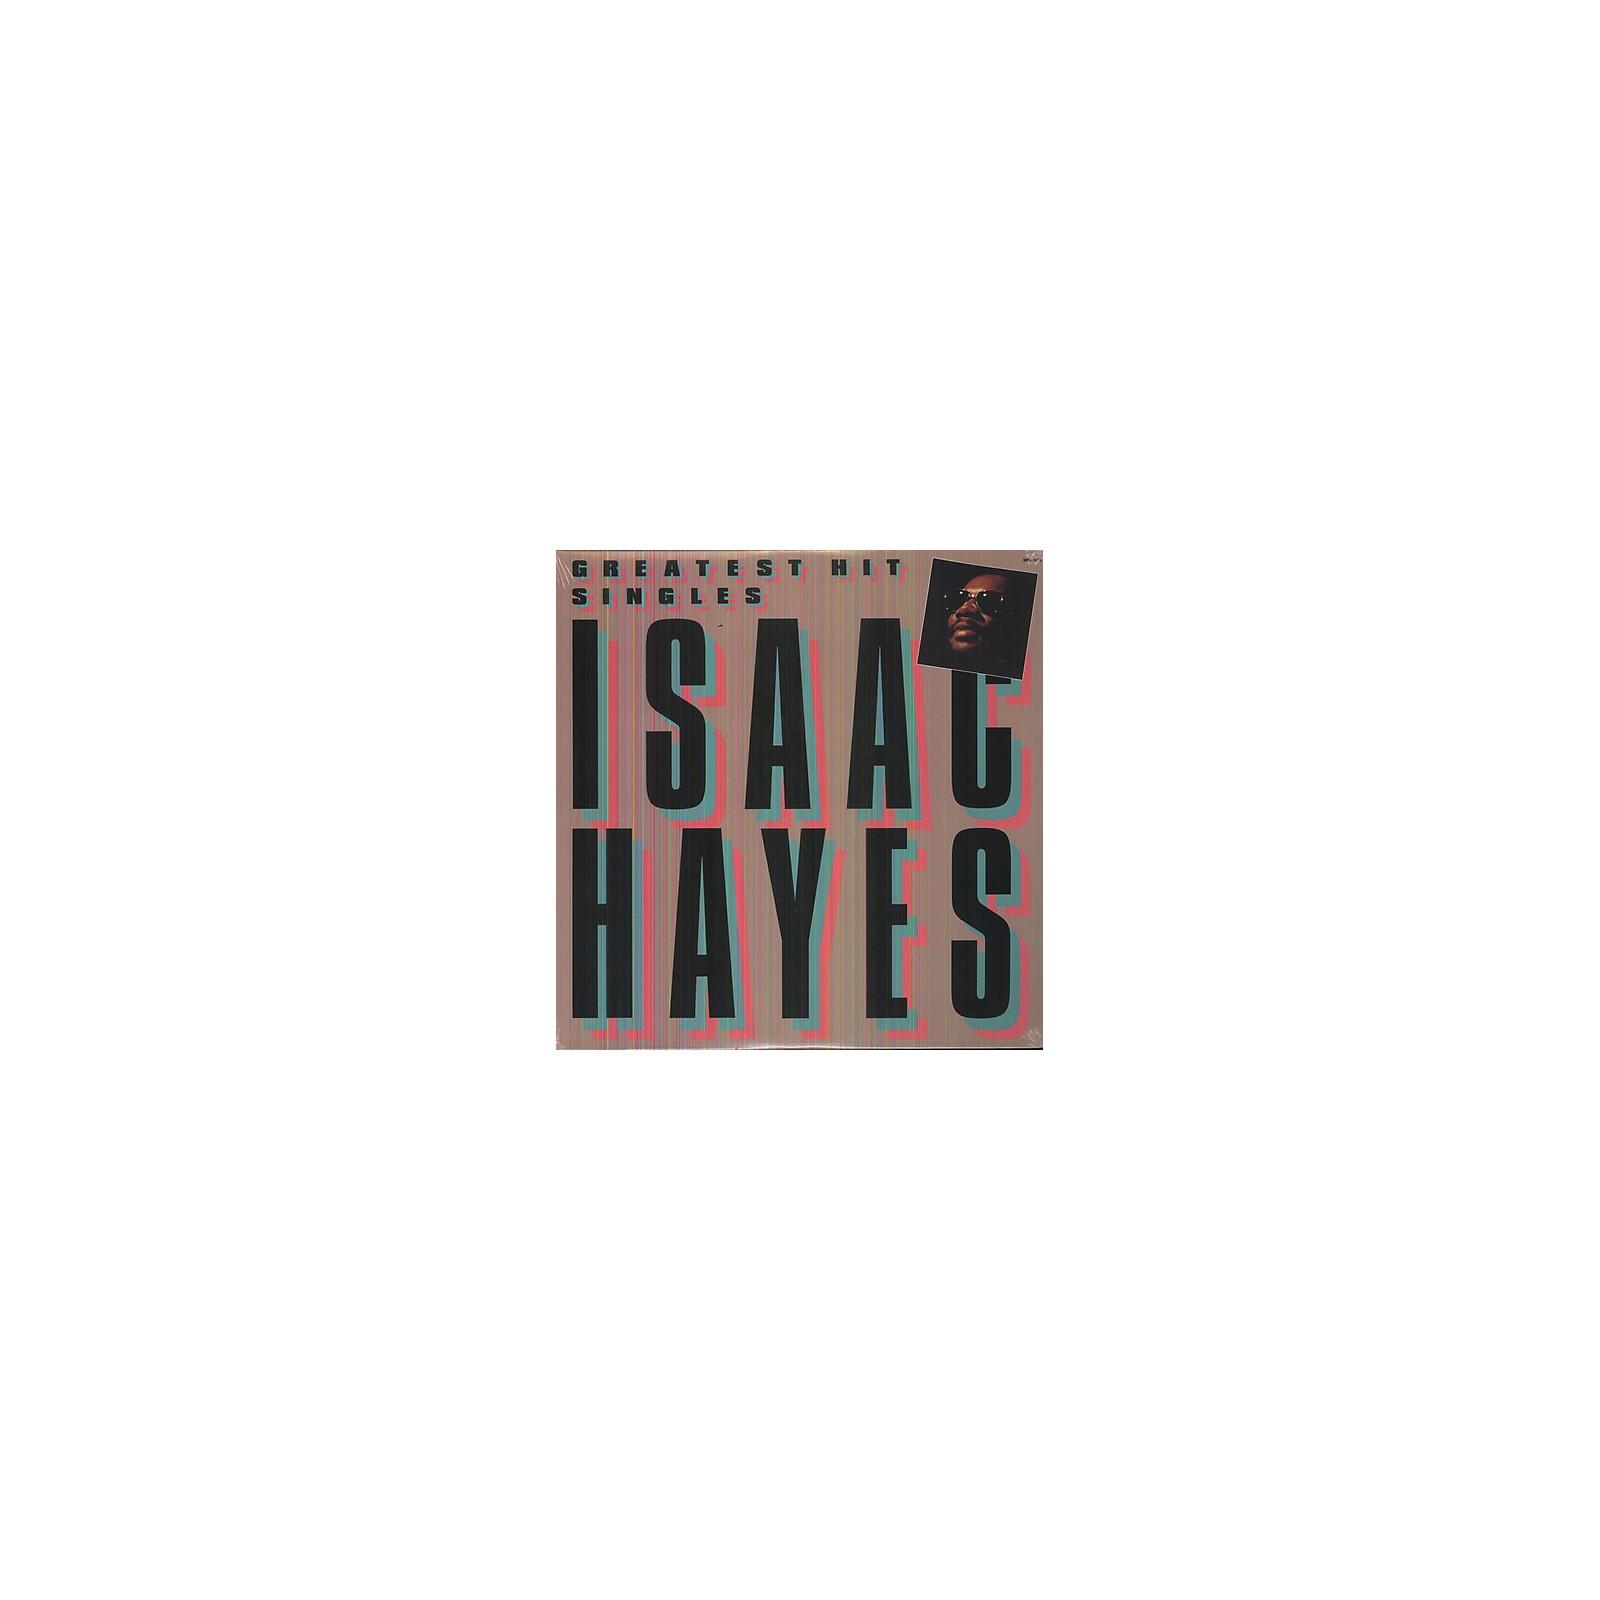 Alliance Isaac Hayes - Greatest Hit Singles